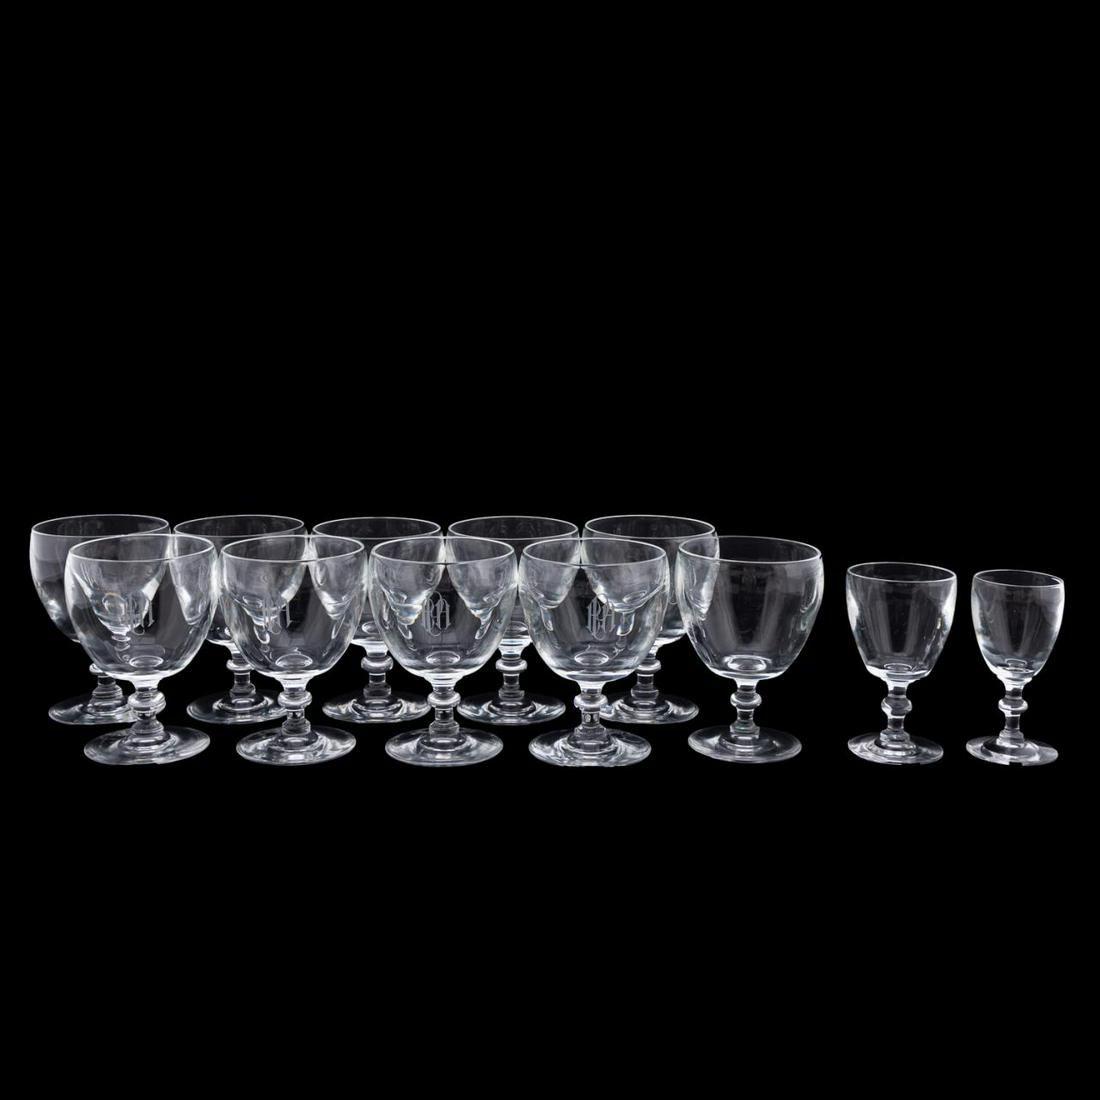 12PC, STEUBEN GLASS MIXED-PATTERN STEMWARE